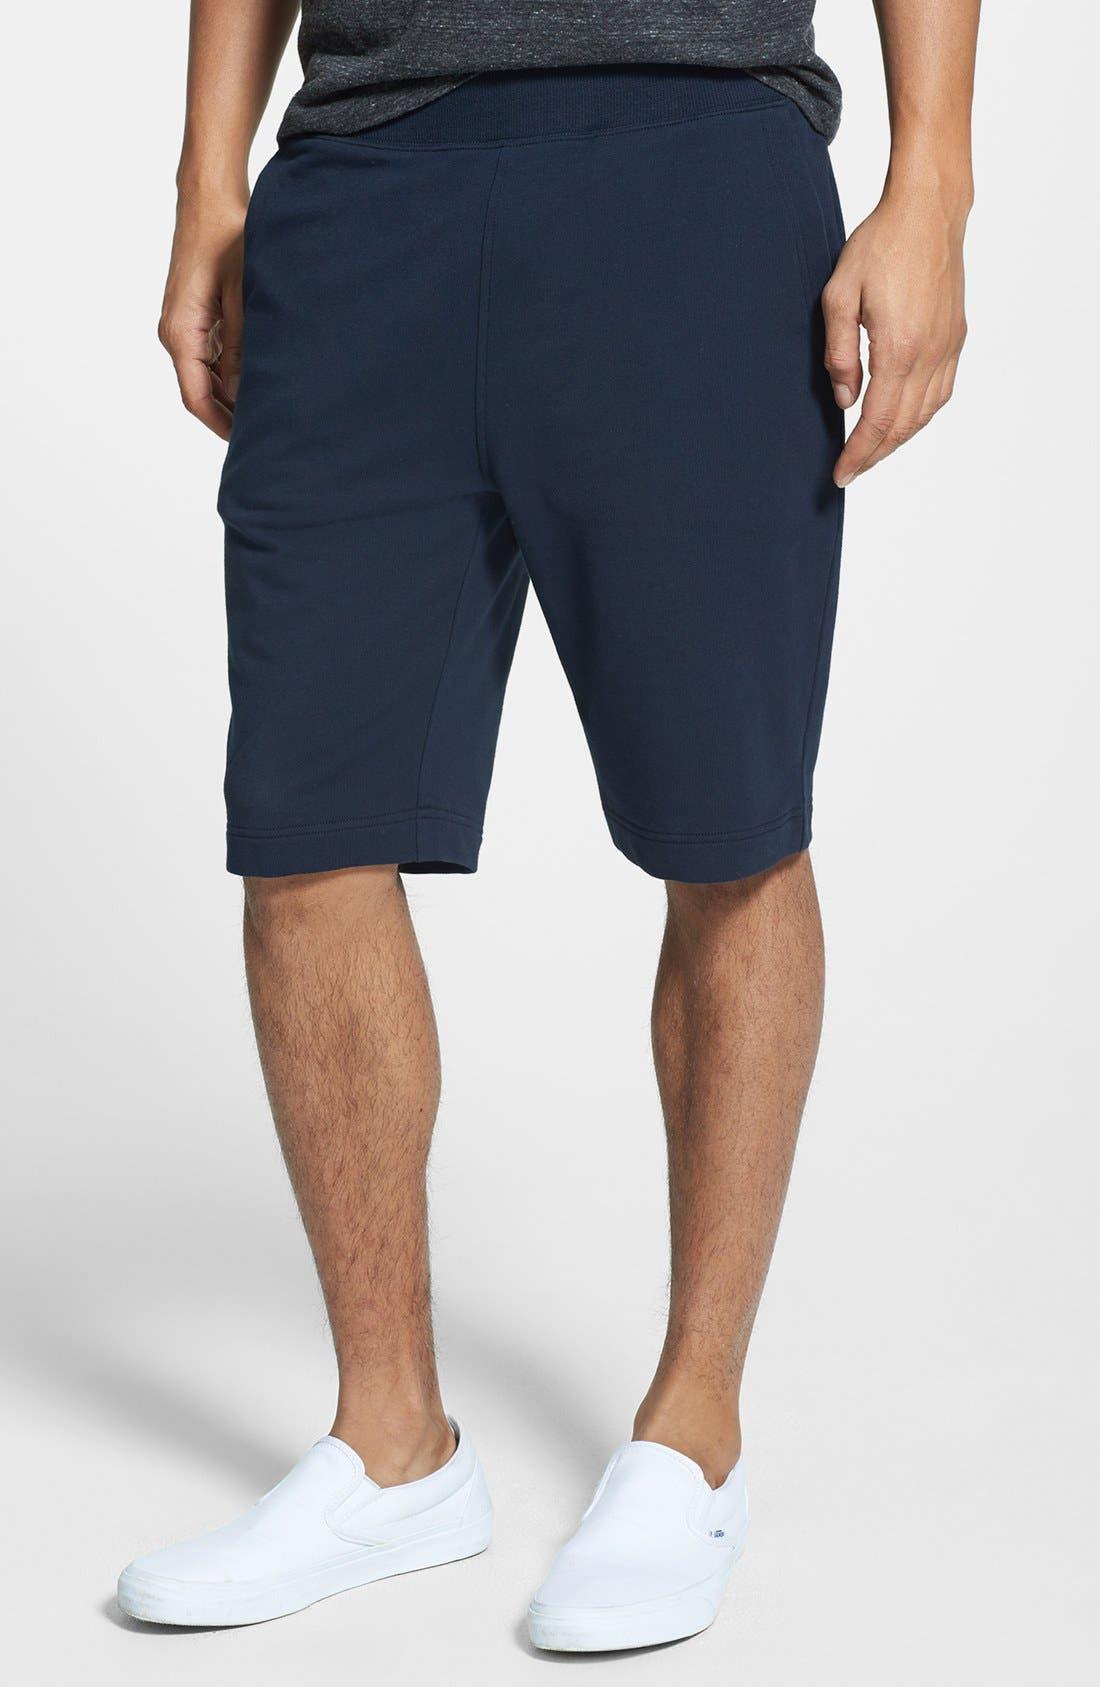 Alternate Image 1 Selected - Michael Kors Fleece Shorts